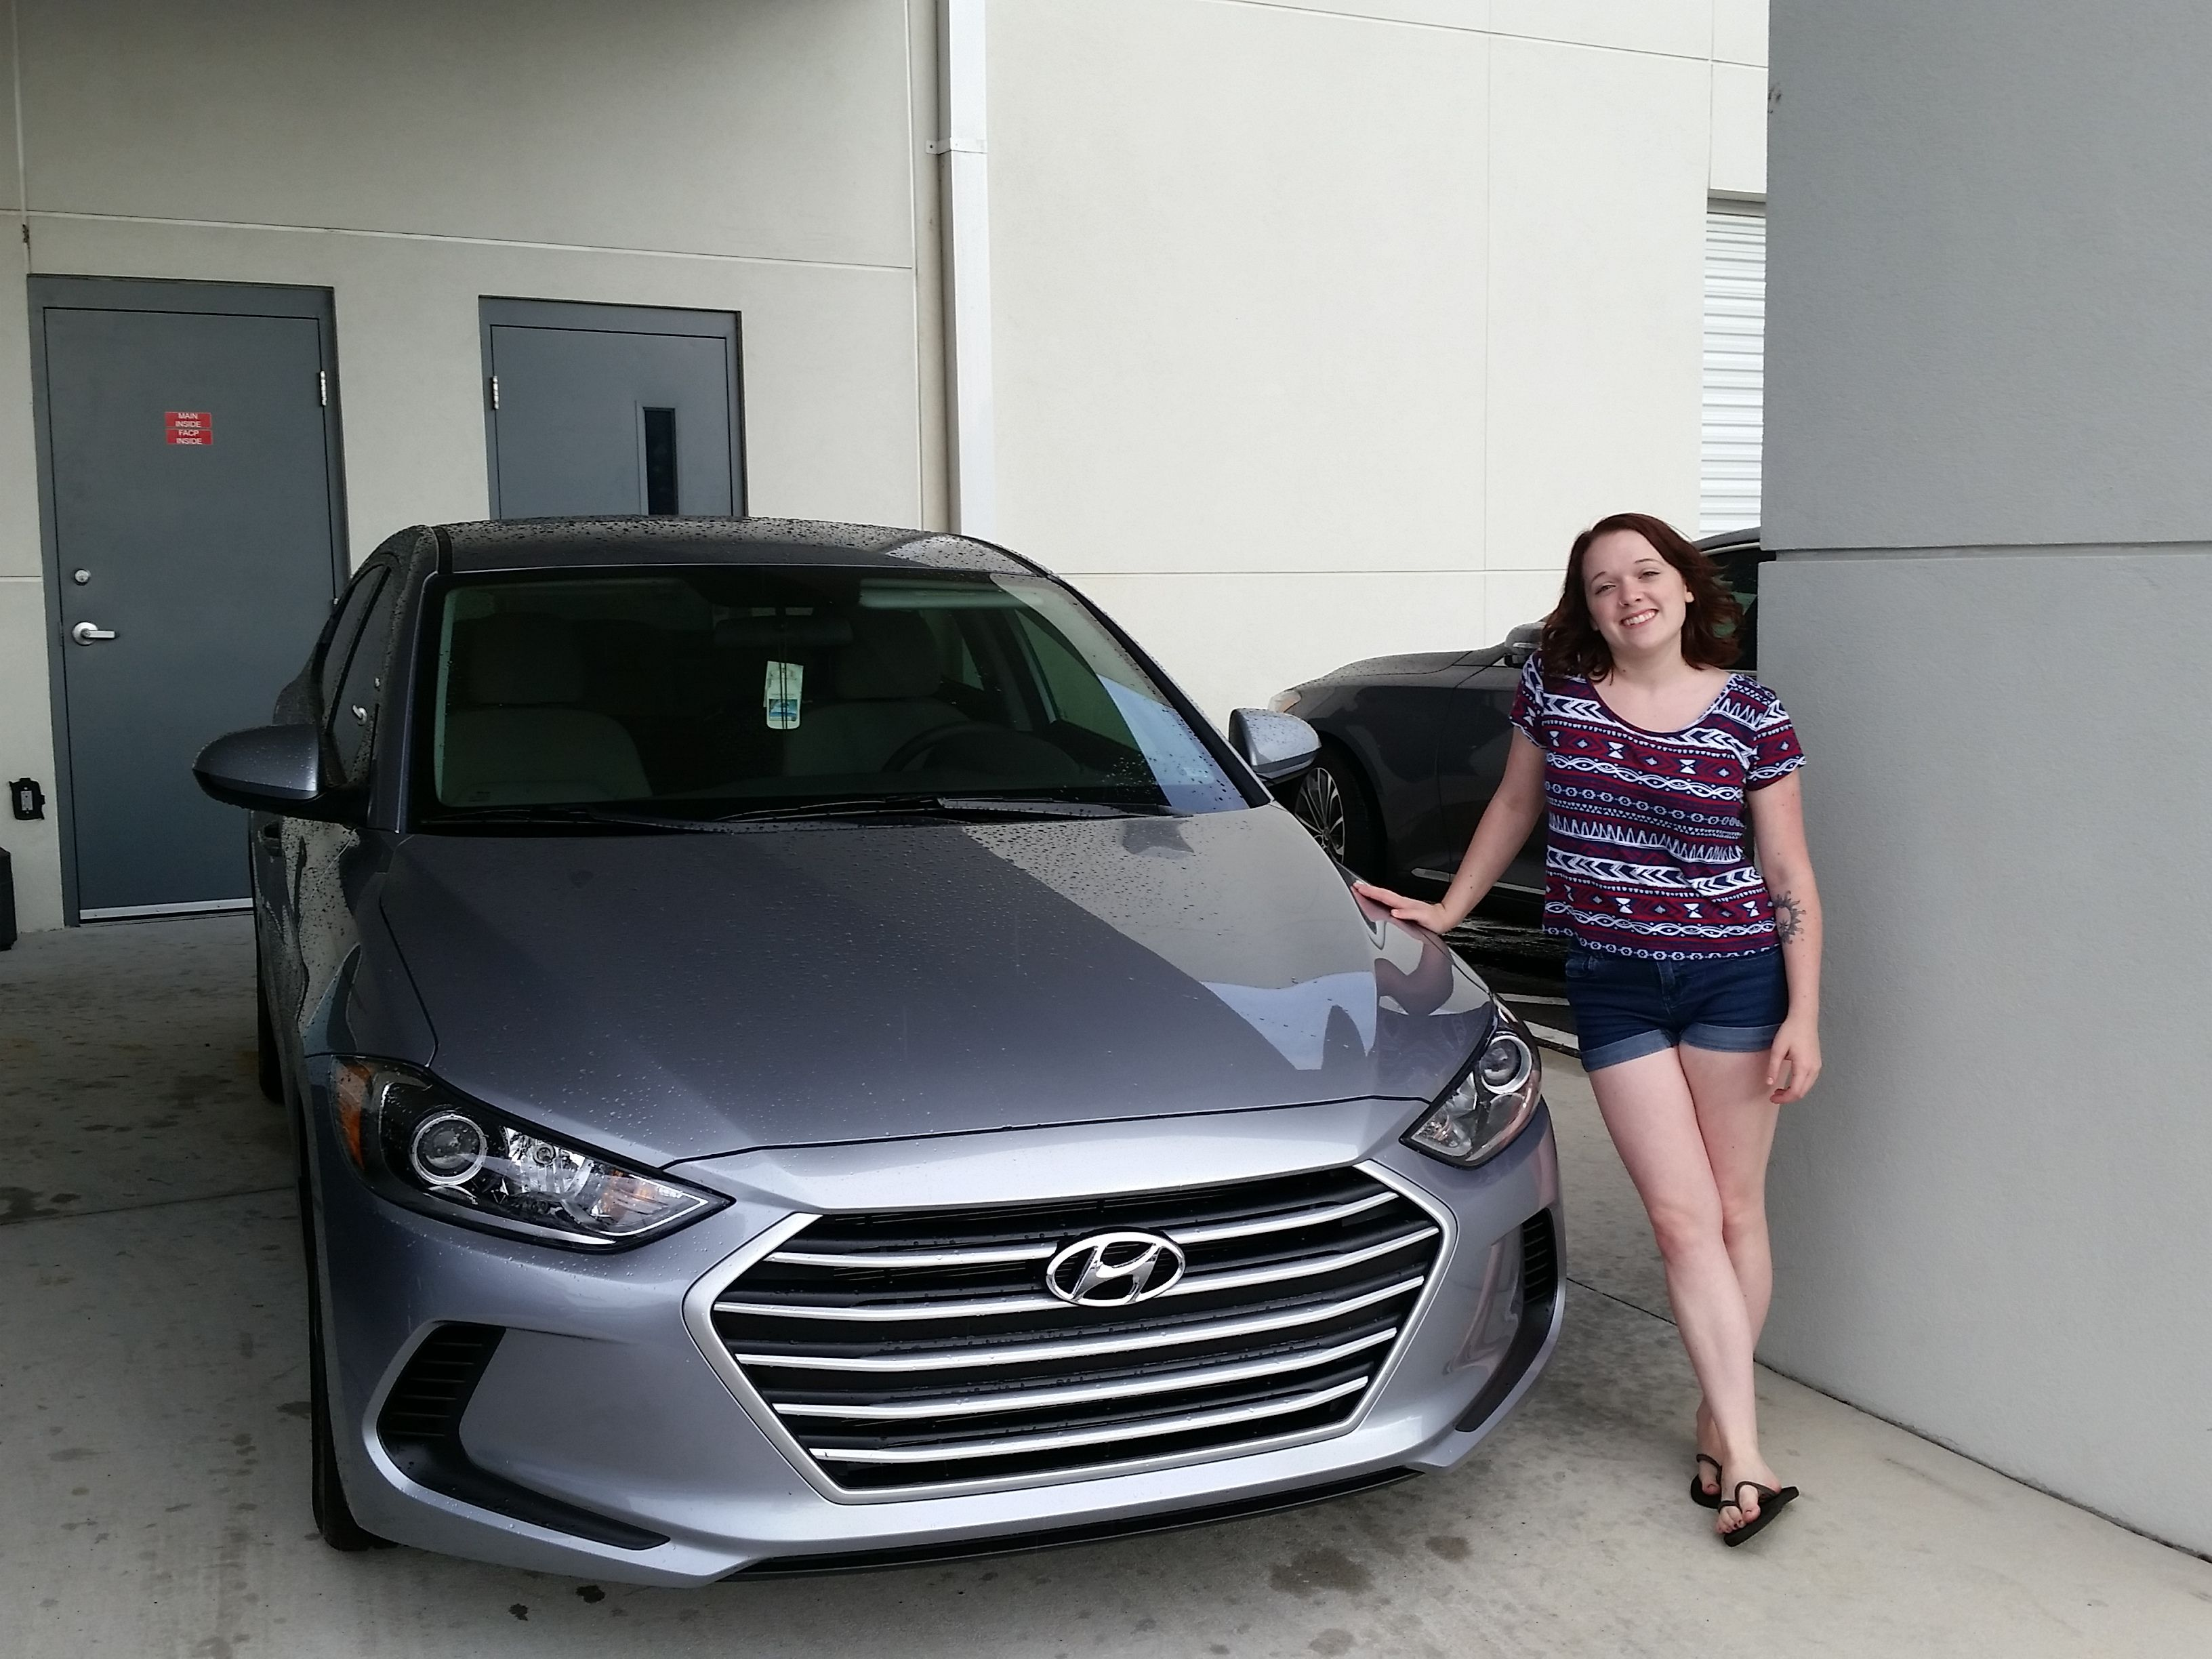 Big thanks to Morgan McLeod for coming to Lakeland Hyundai and ...